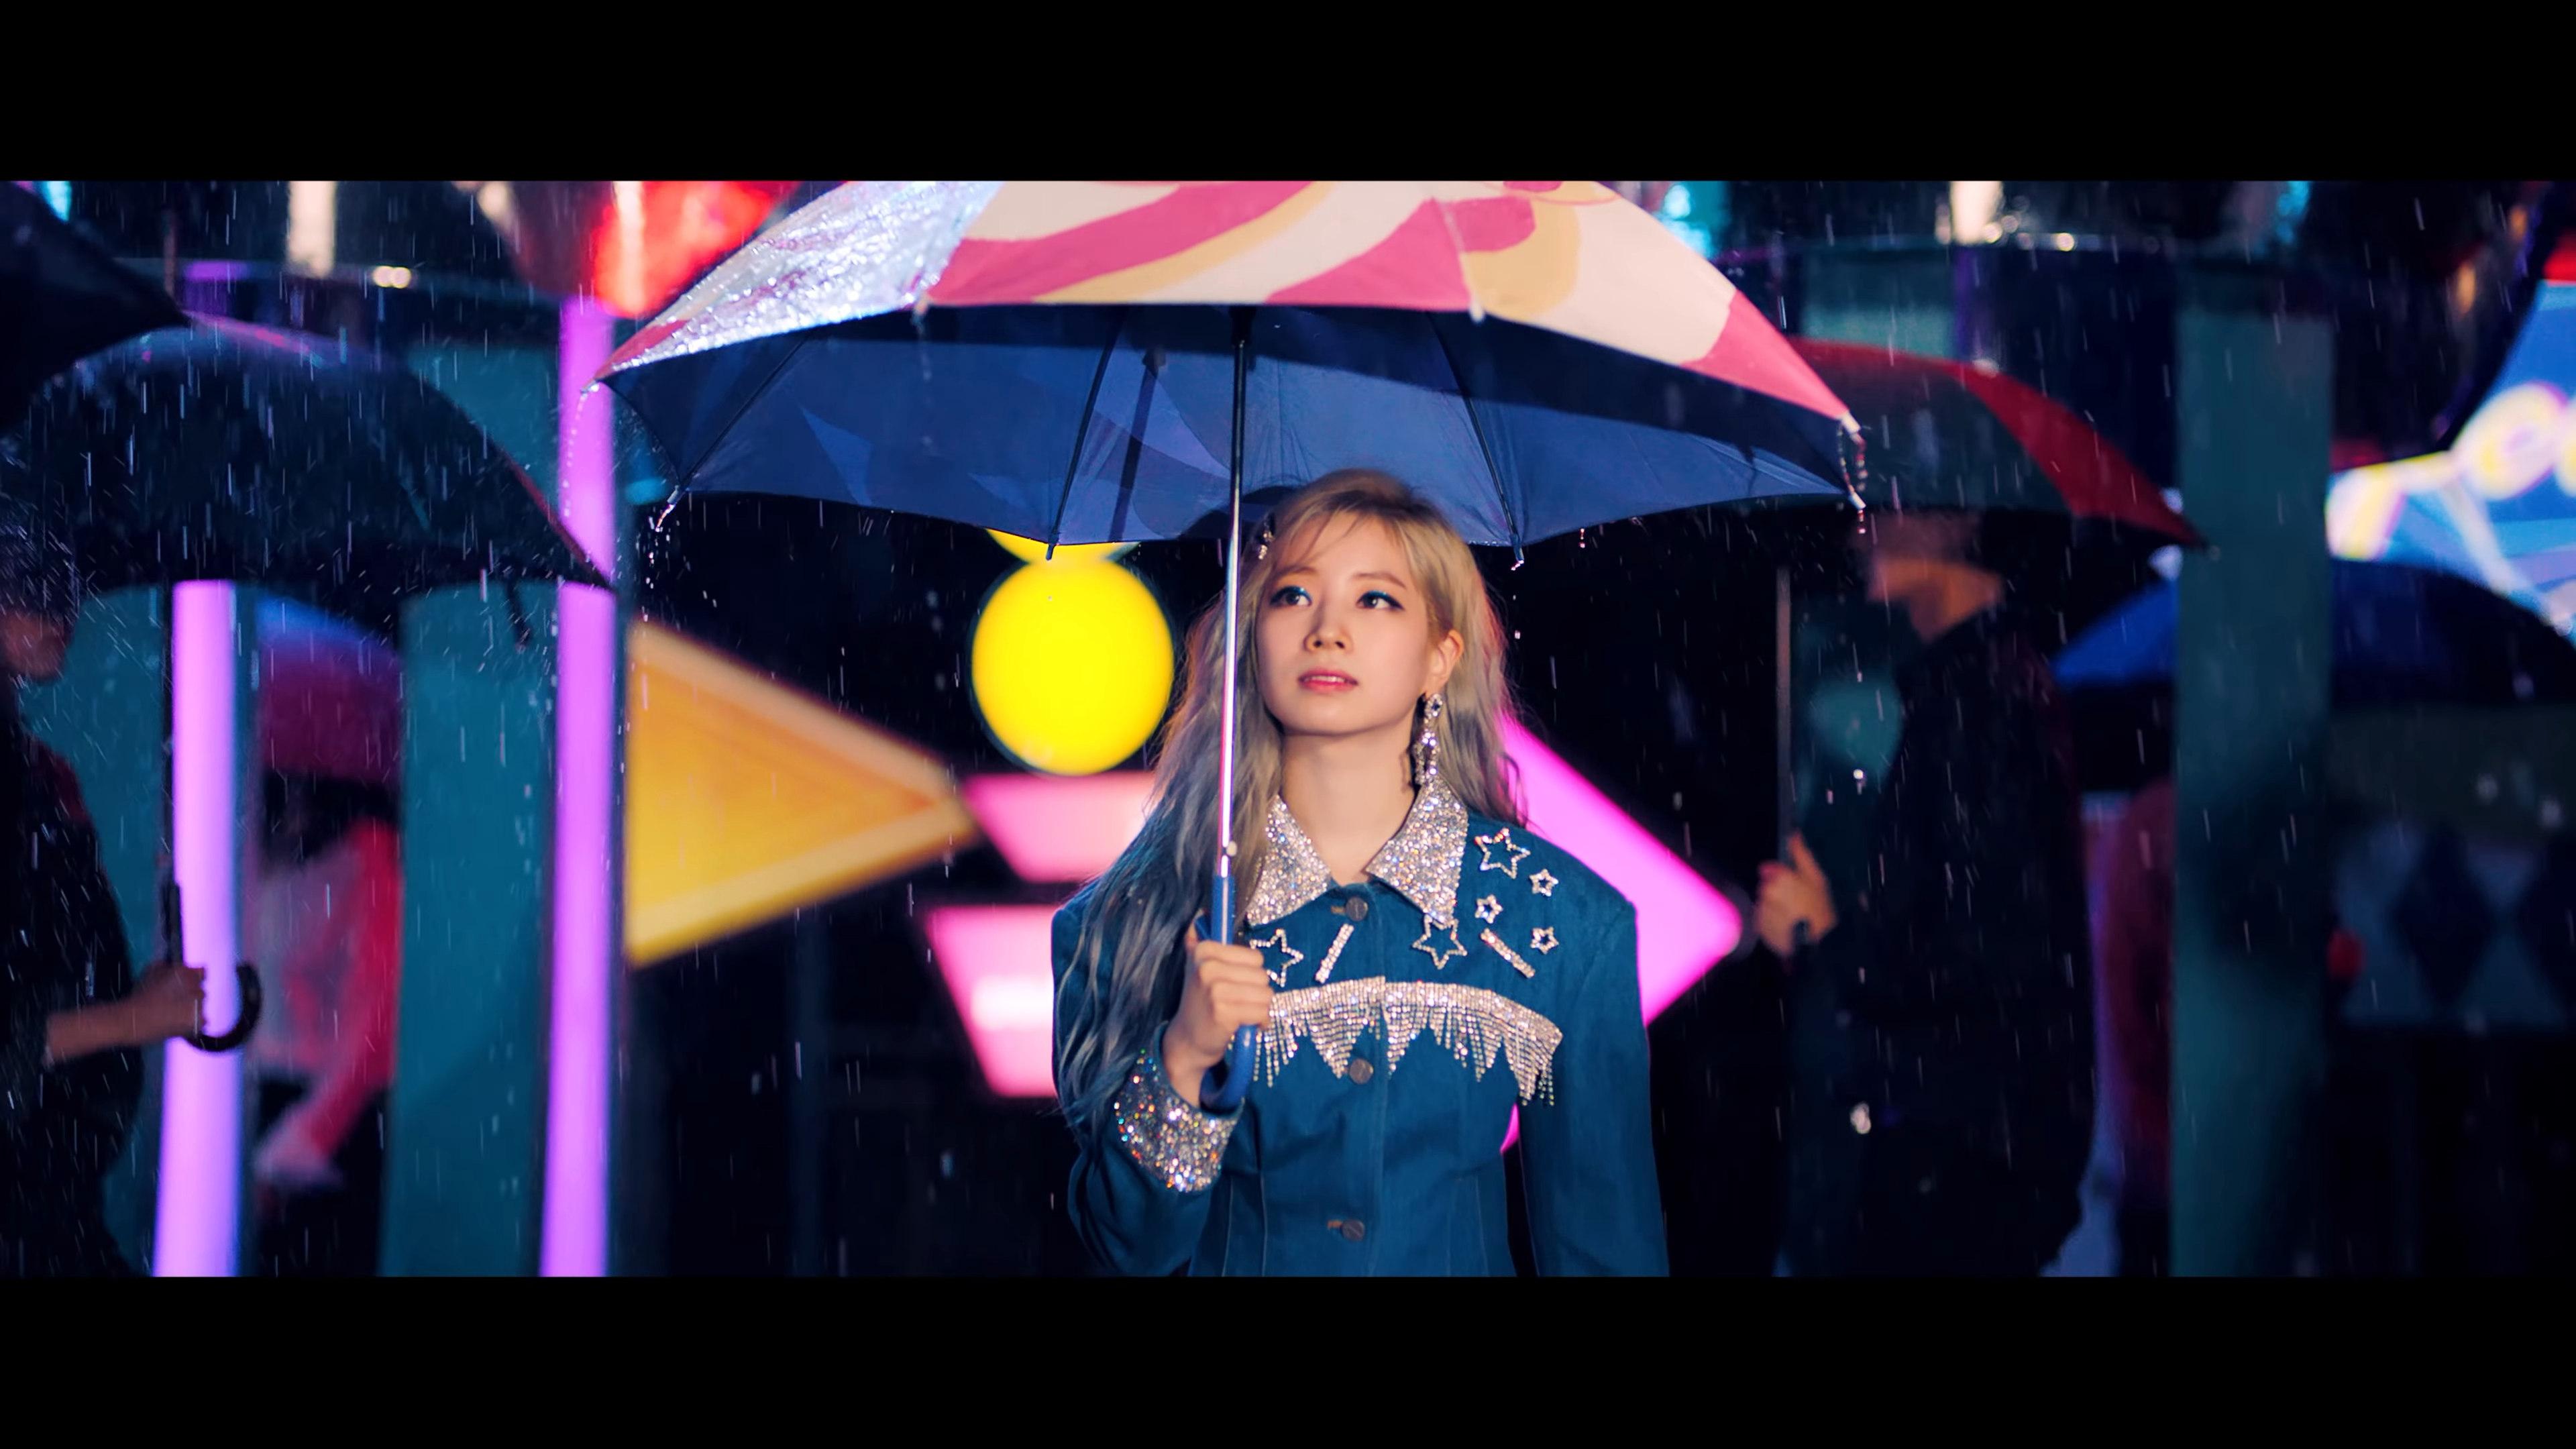 Twice Feel Special Dahyun Mv Teaser Screencaps Hdhr K